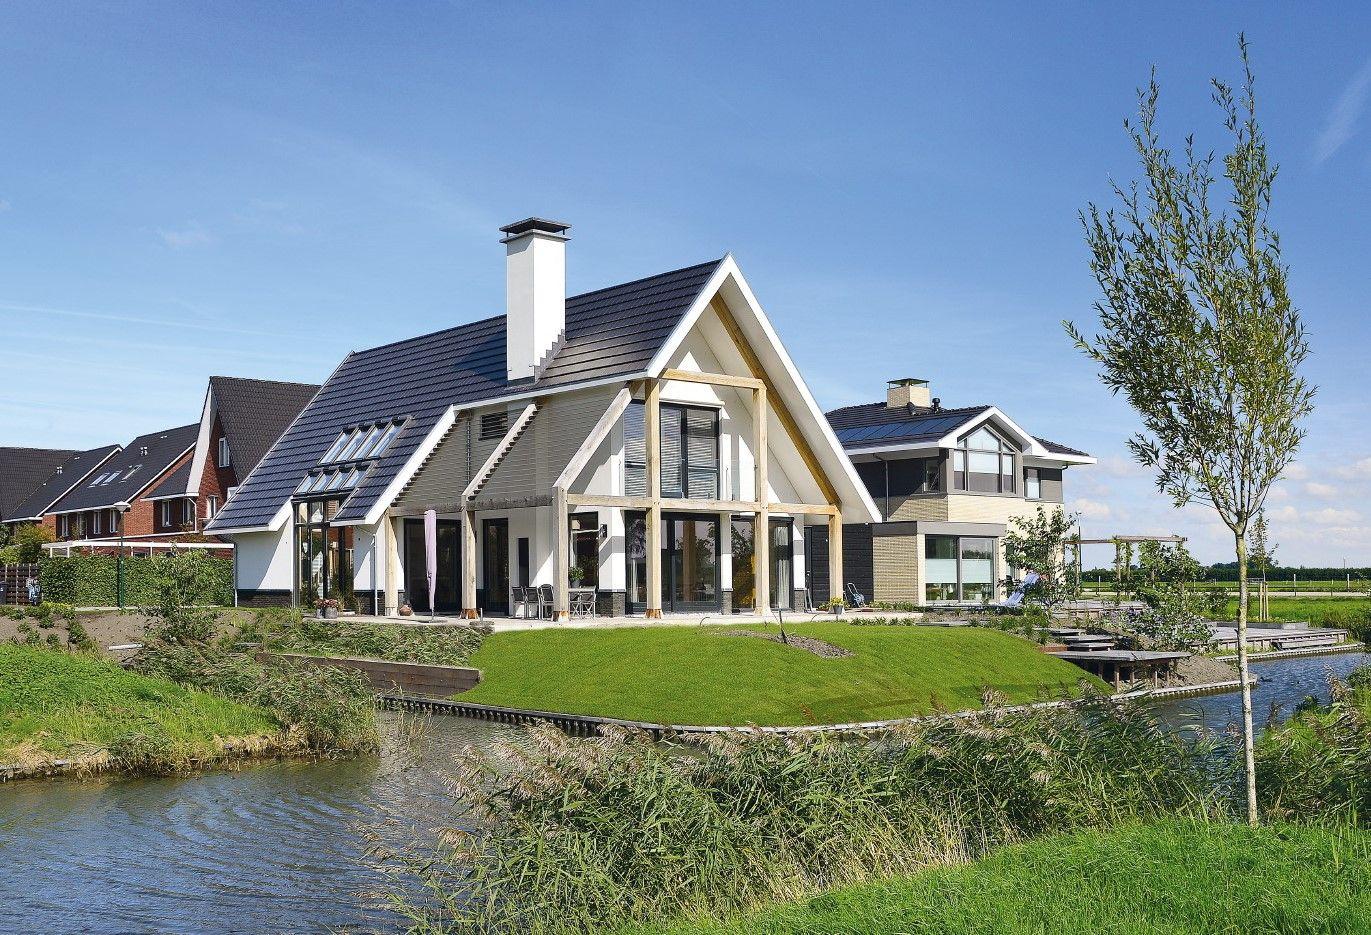 Wonen 2 bekhuis kleinjan home sweet home pinterest nieuwbouw huizen en architectuur - Huis interieur architectuur ...